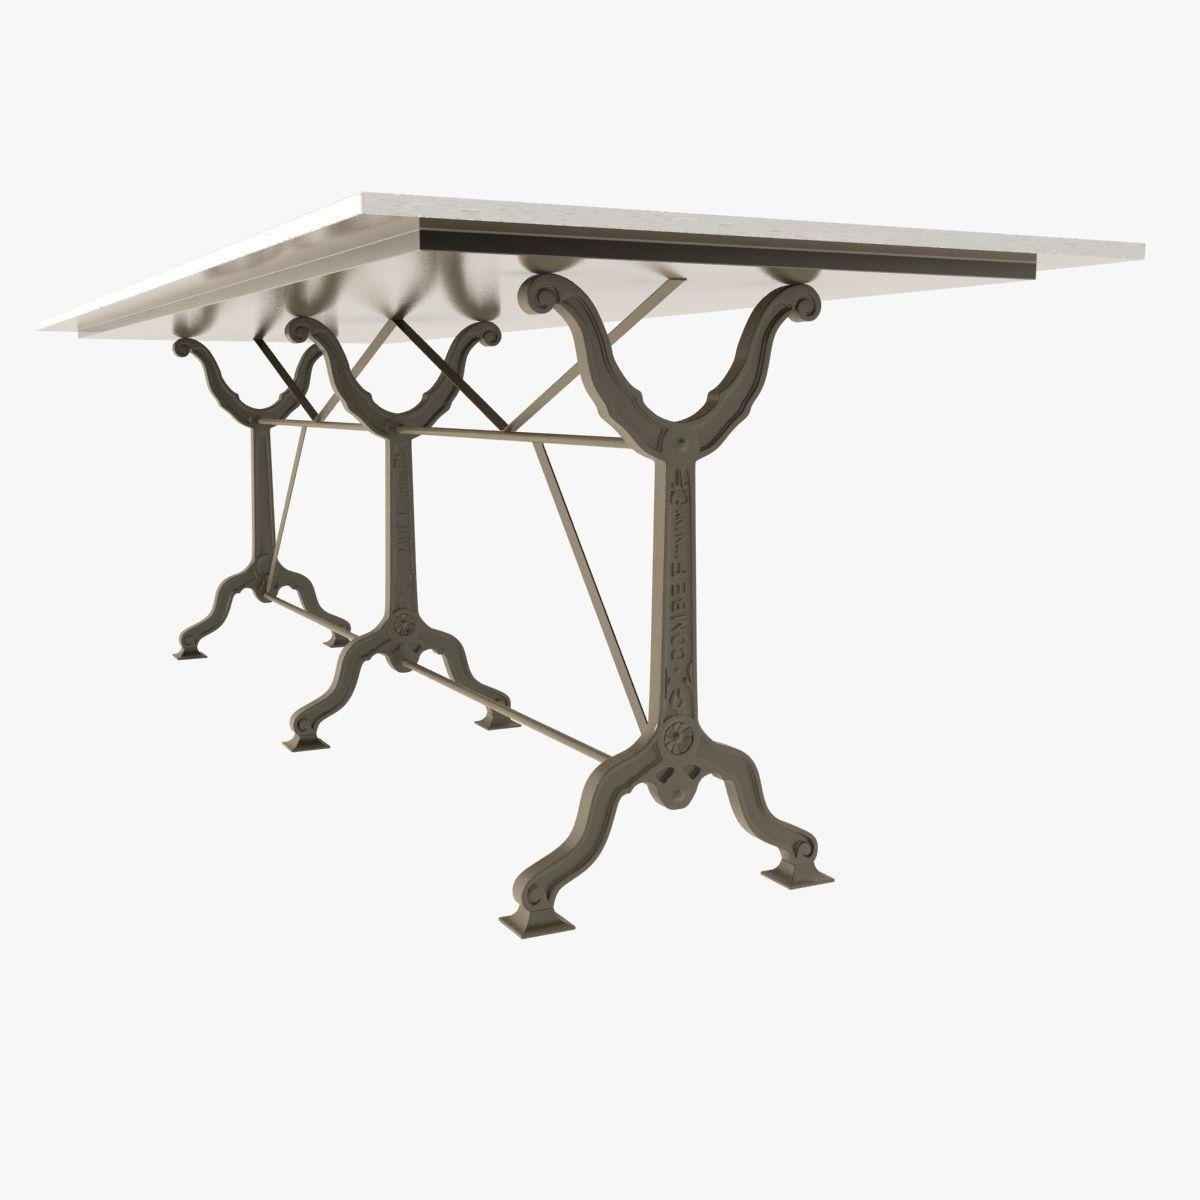 Restoration Hardware Factory Zinc Cast Iron Dining Tables Model